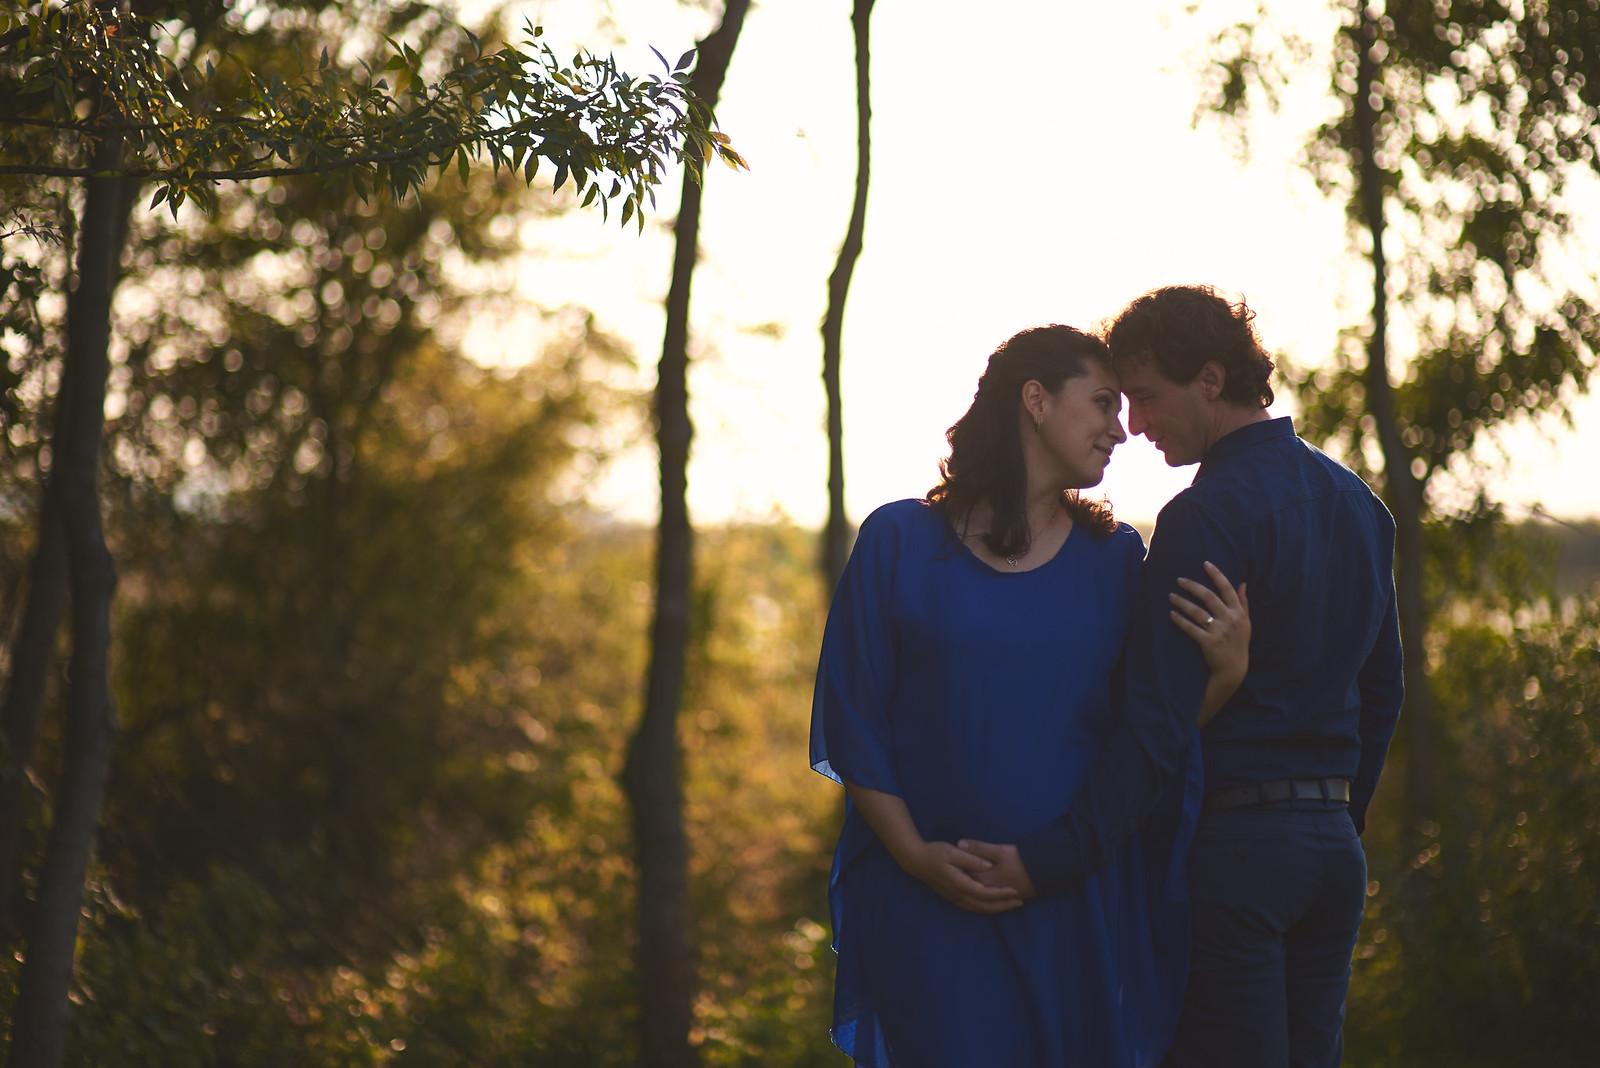 Maternity Photo, Couple, epspictures, Endless Purple Skies, Bucharest Photography